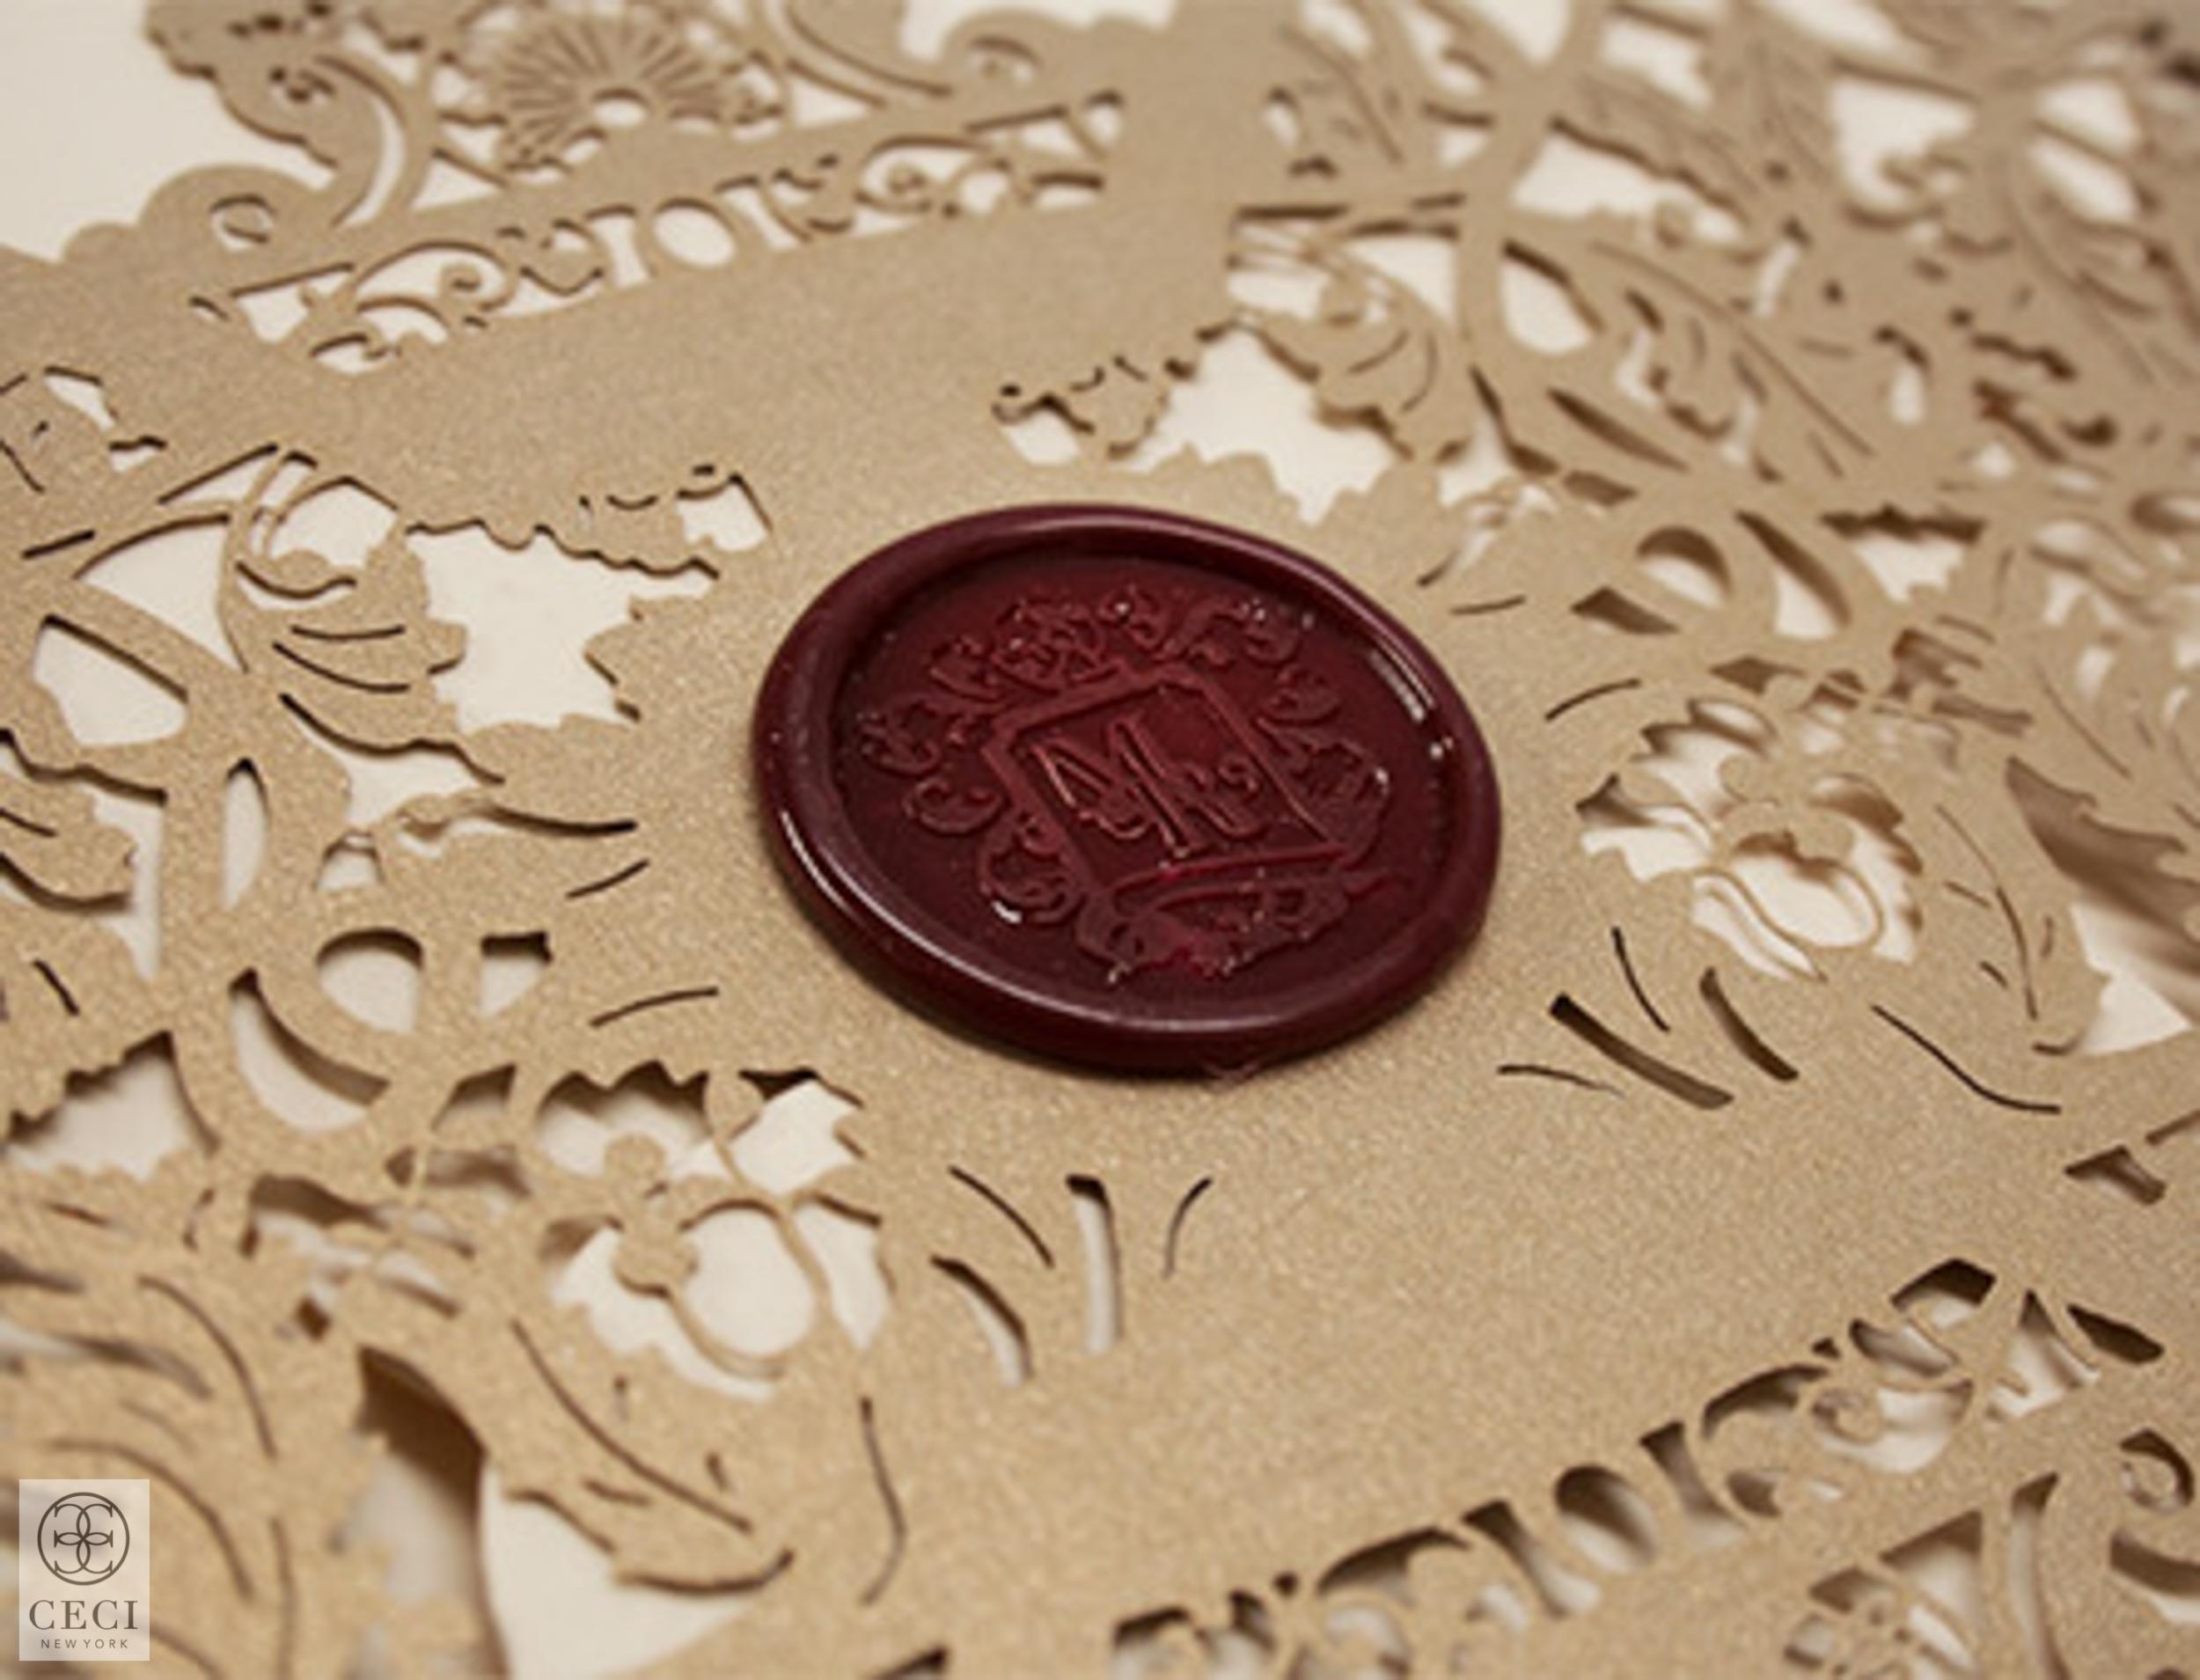 Ceci_New_York_Wedding_Lake_Como_Italy_Luxury_Style_Custom_Invitation-8.jpg